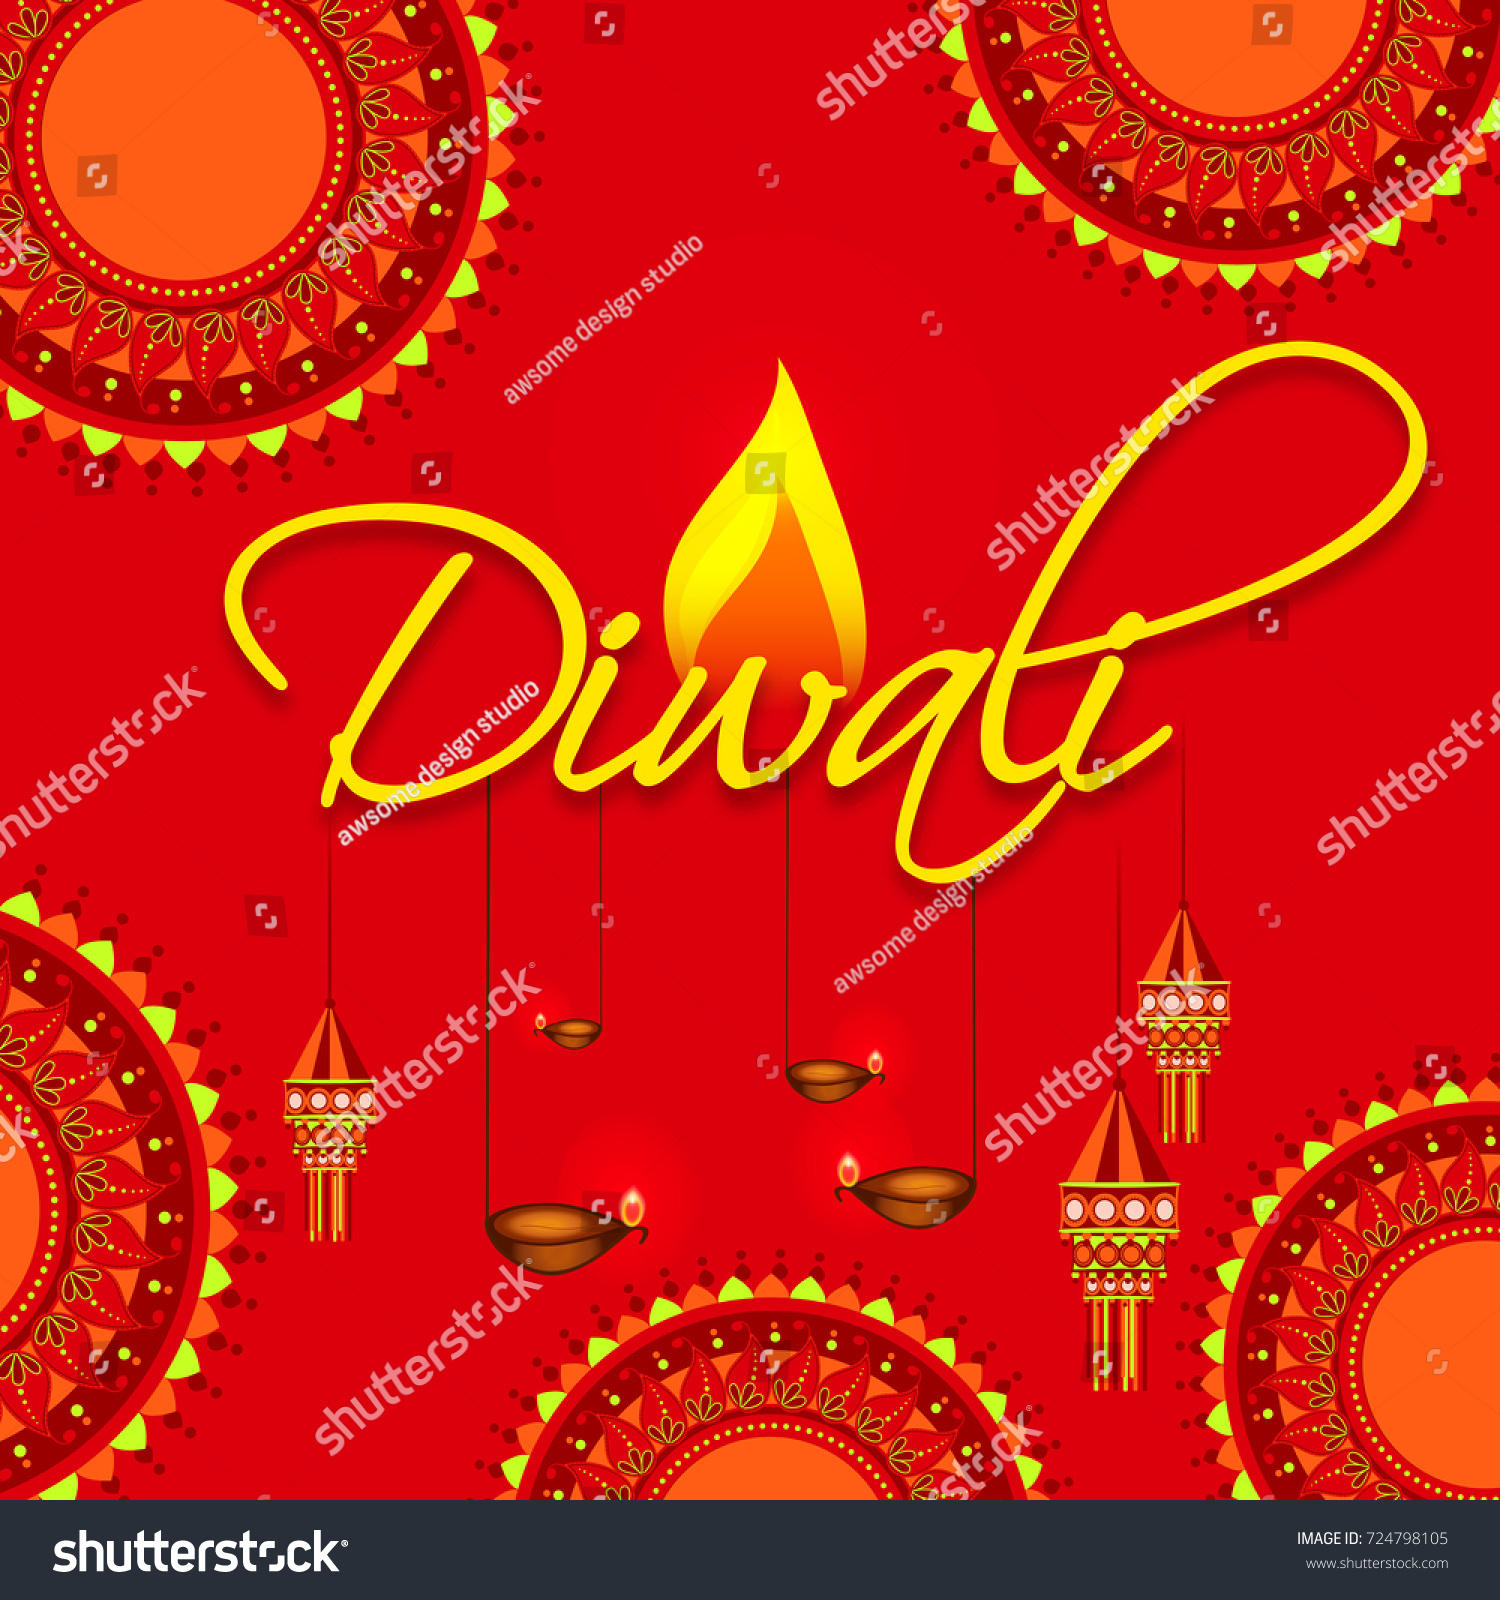 Happy Diwali Diwali Wishes Illustration Greeting Stock Vector